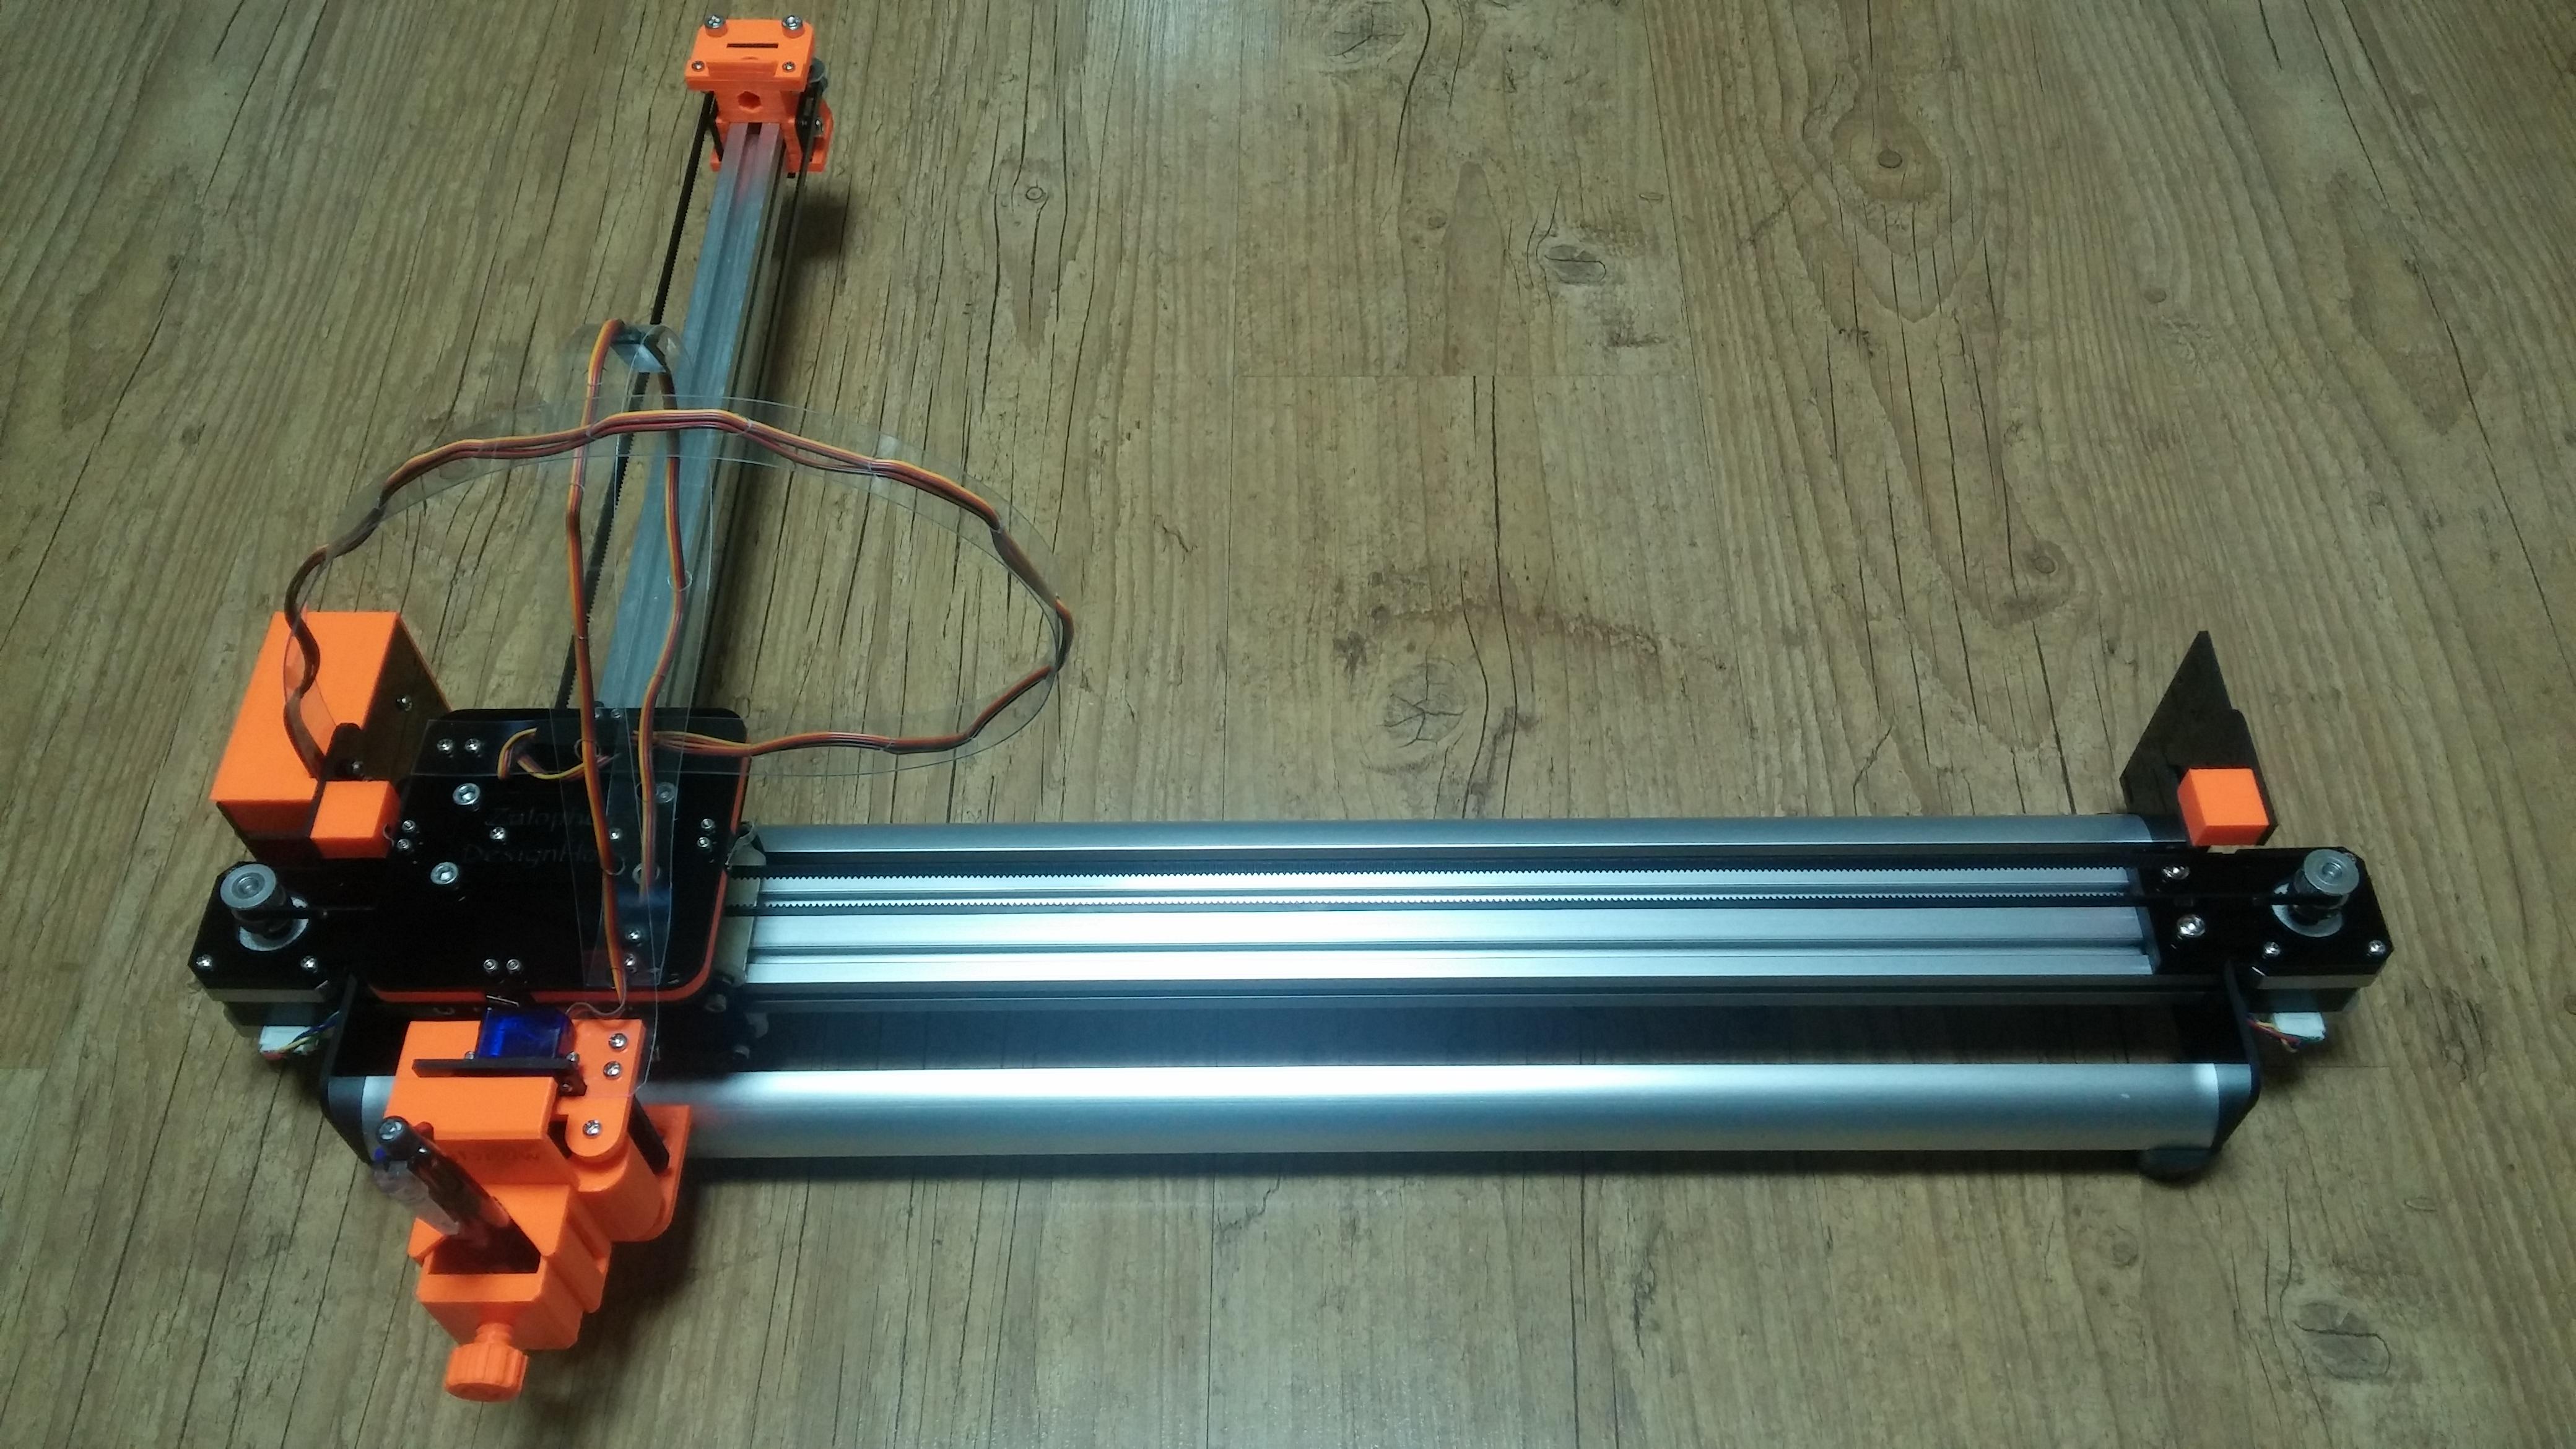 4xiDraw V1 / A3 - Drawing Machine: Drawing